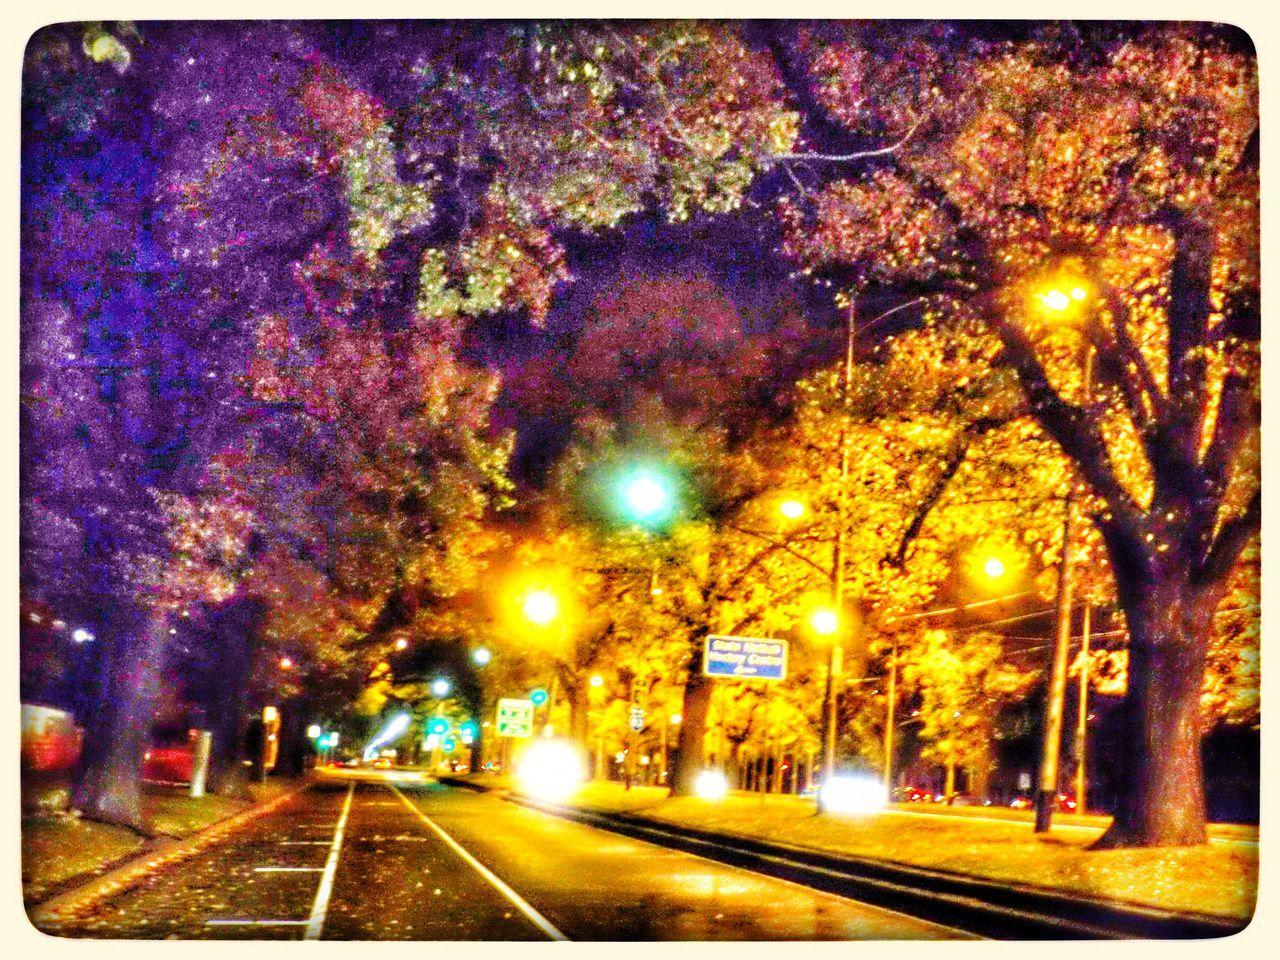 illuminated, night, transportation, tree, street light, railroad track, outdoors, no people, road, city, sky, nature